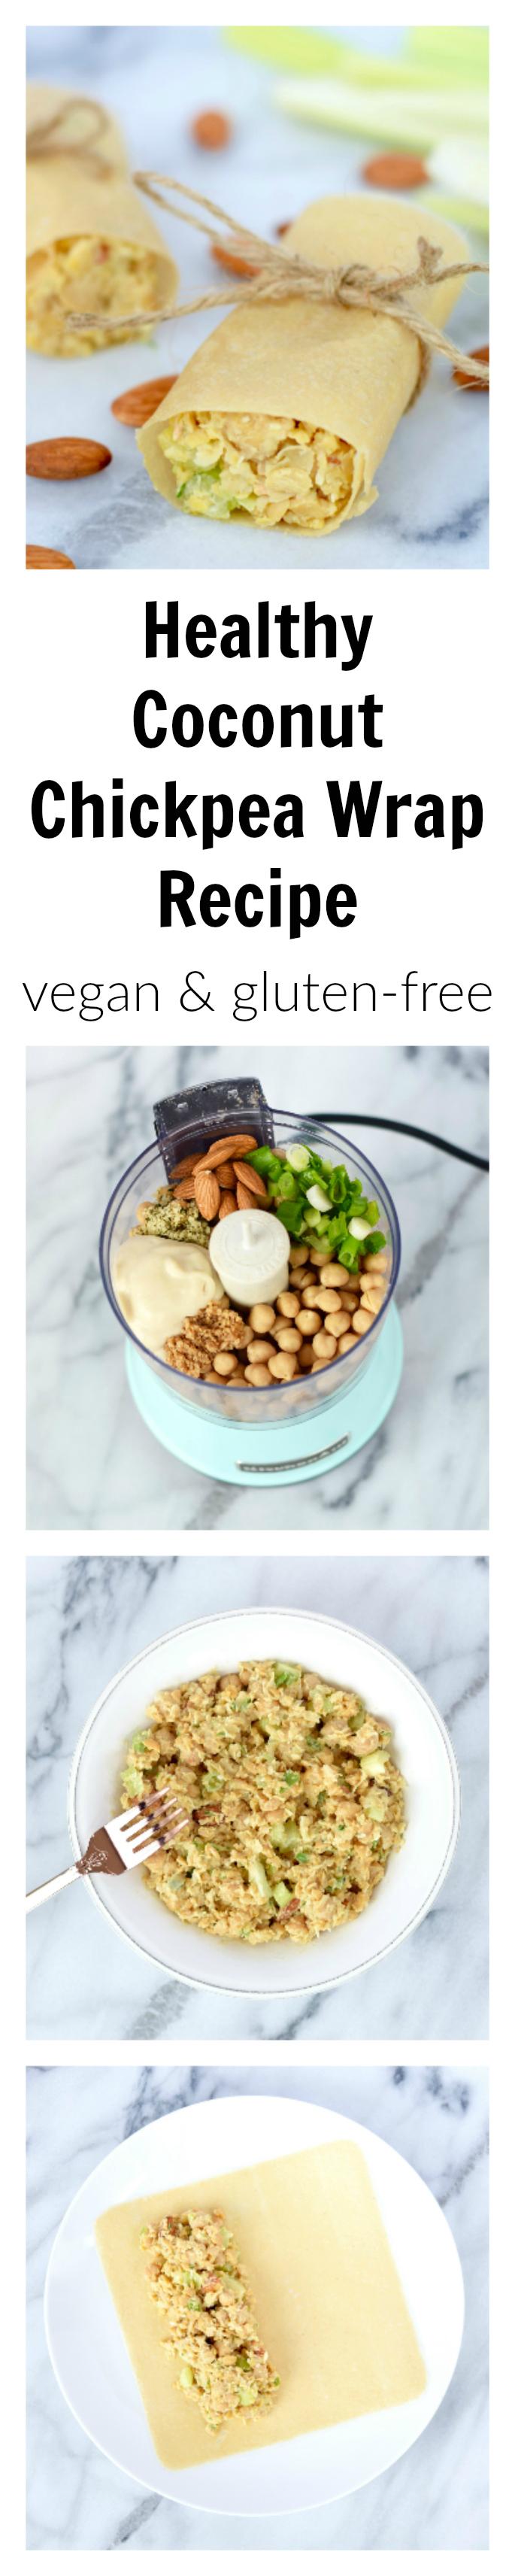 Vegan Gluten-Free Healthy Coconut Chickpea Wraps-2